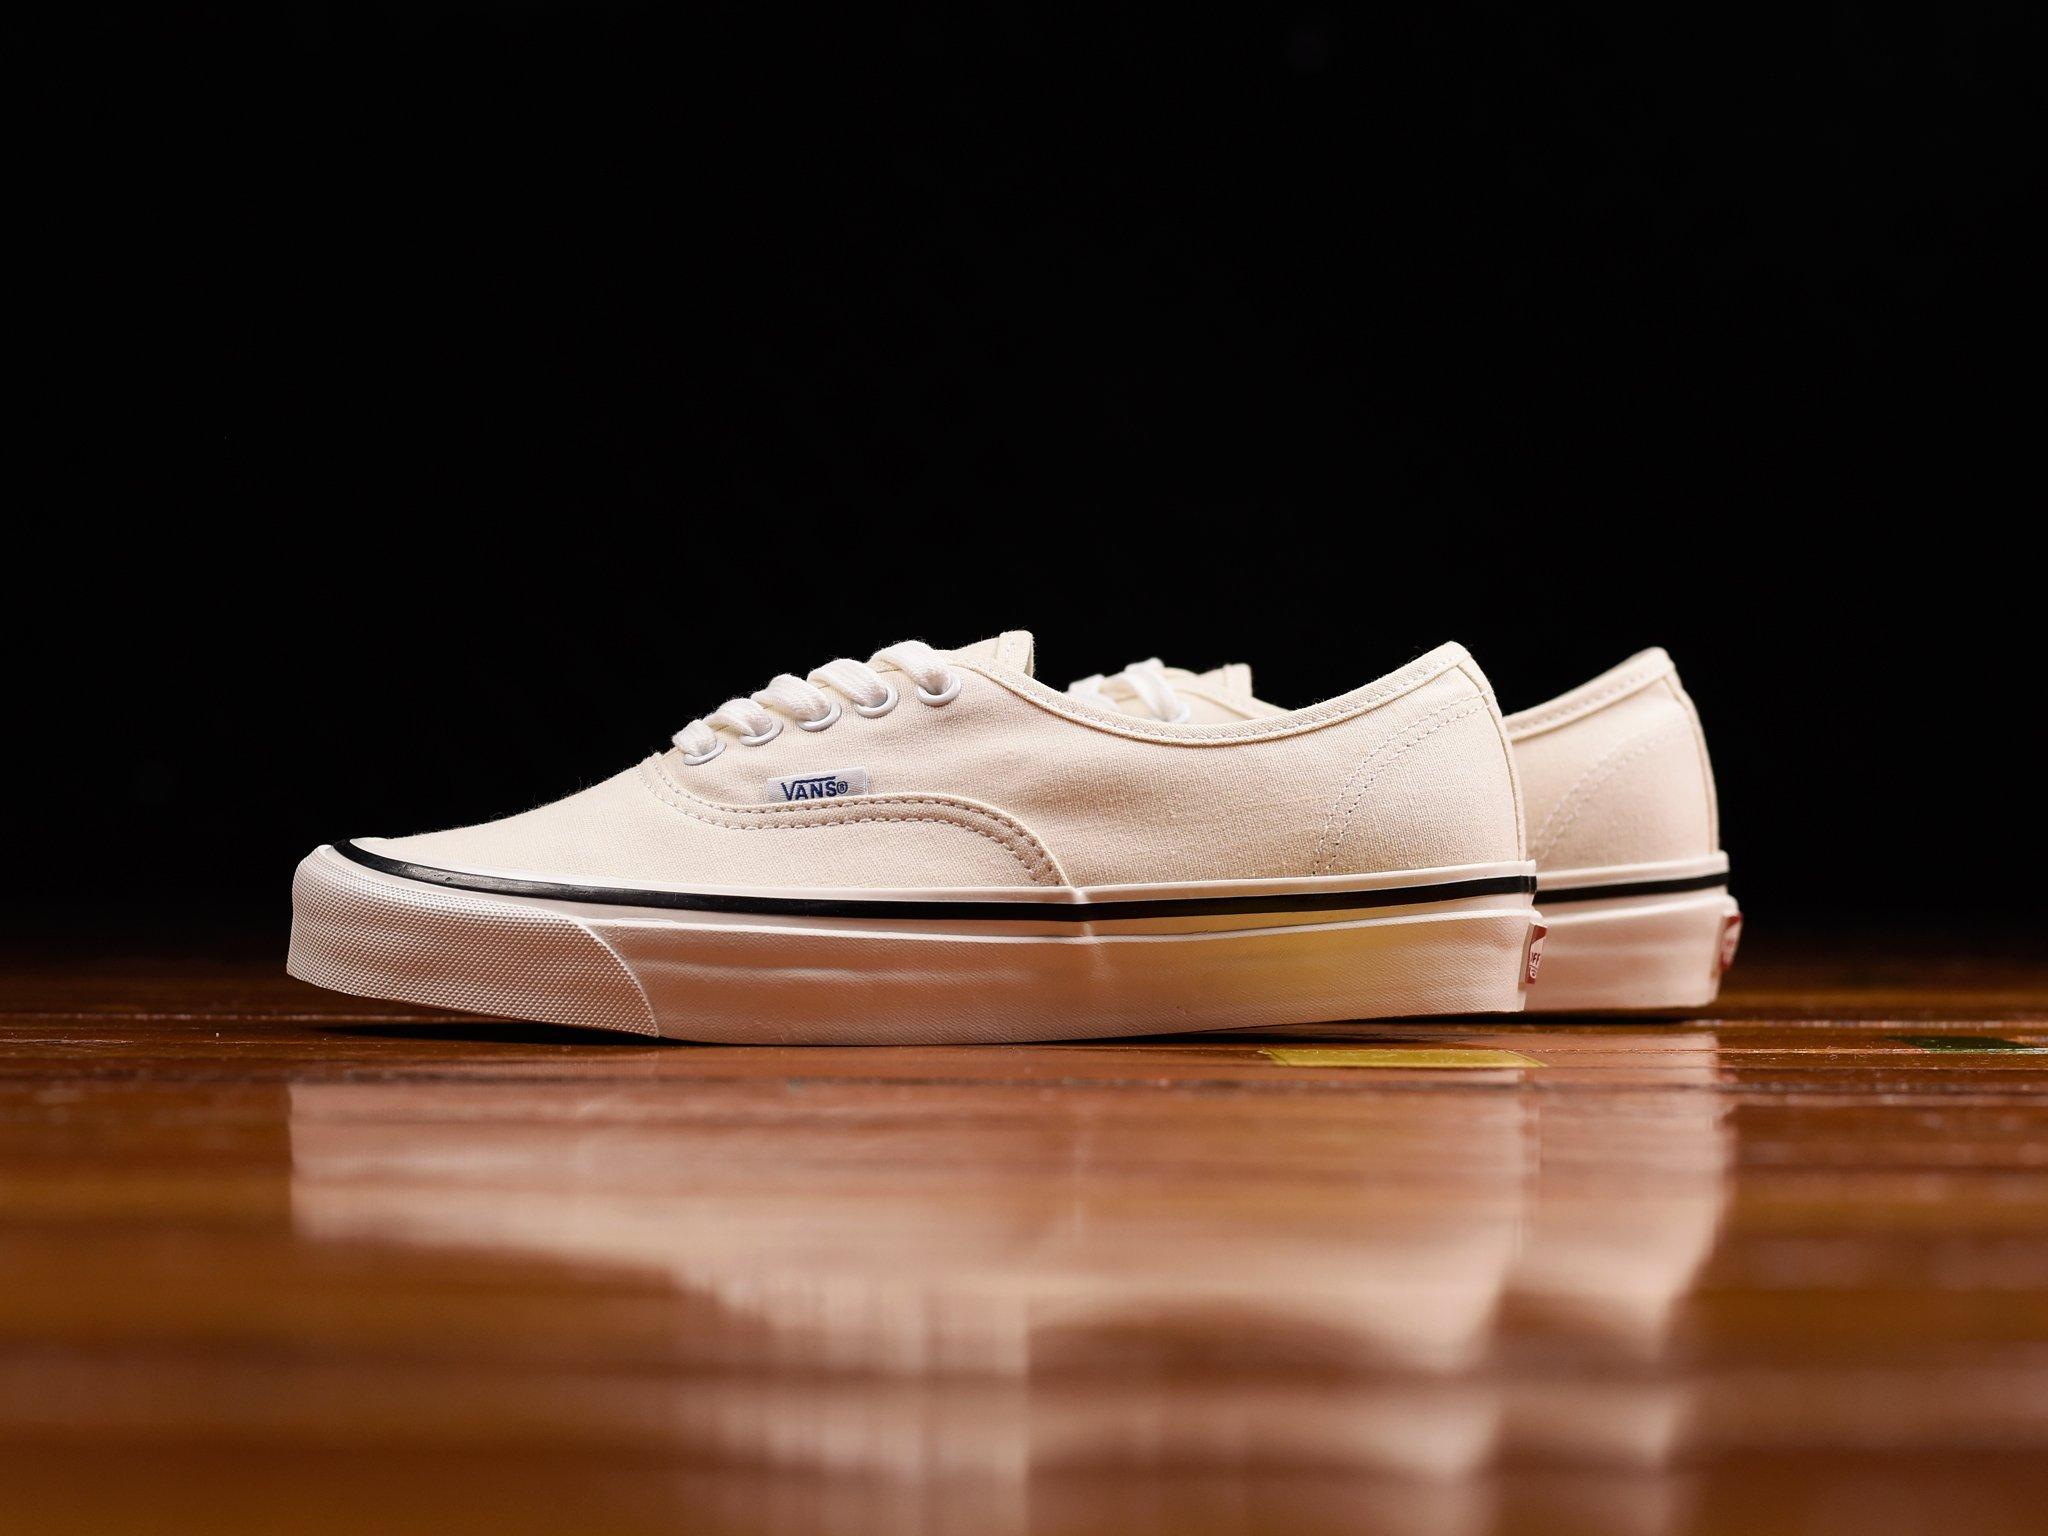 Vans Anaheim Factory Authentic 44 Dx Classic White Vn0a38enmr4 Vans Vans Shop Vans Old Skool Sneaker